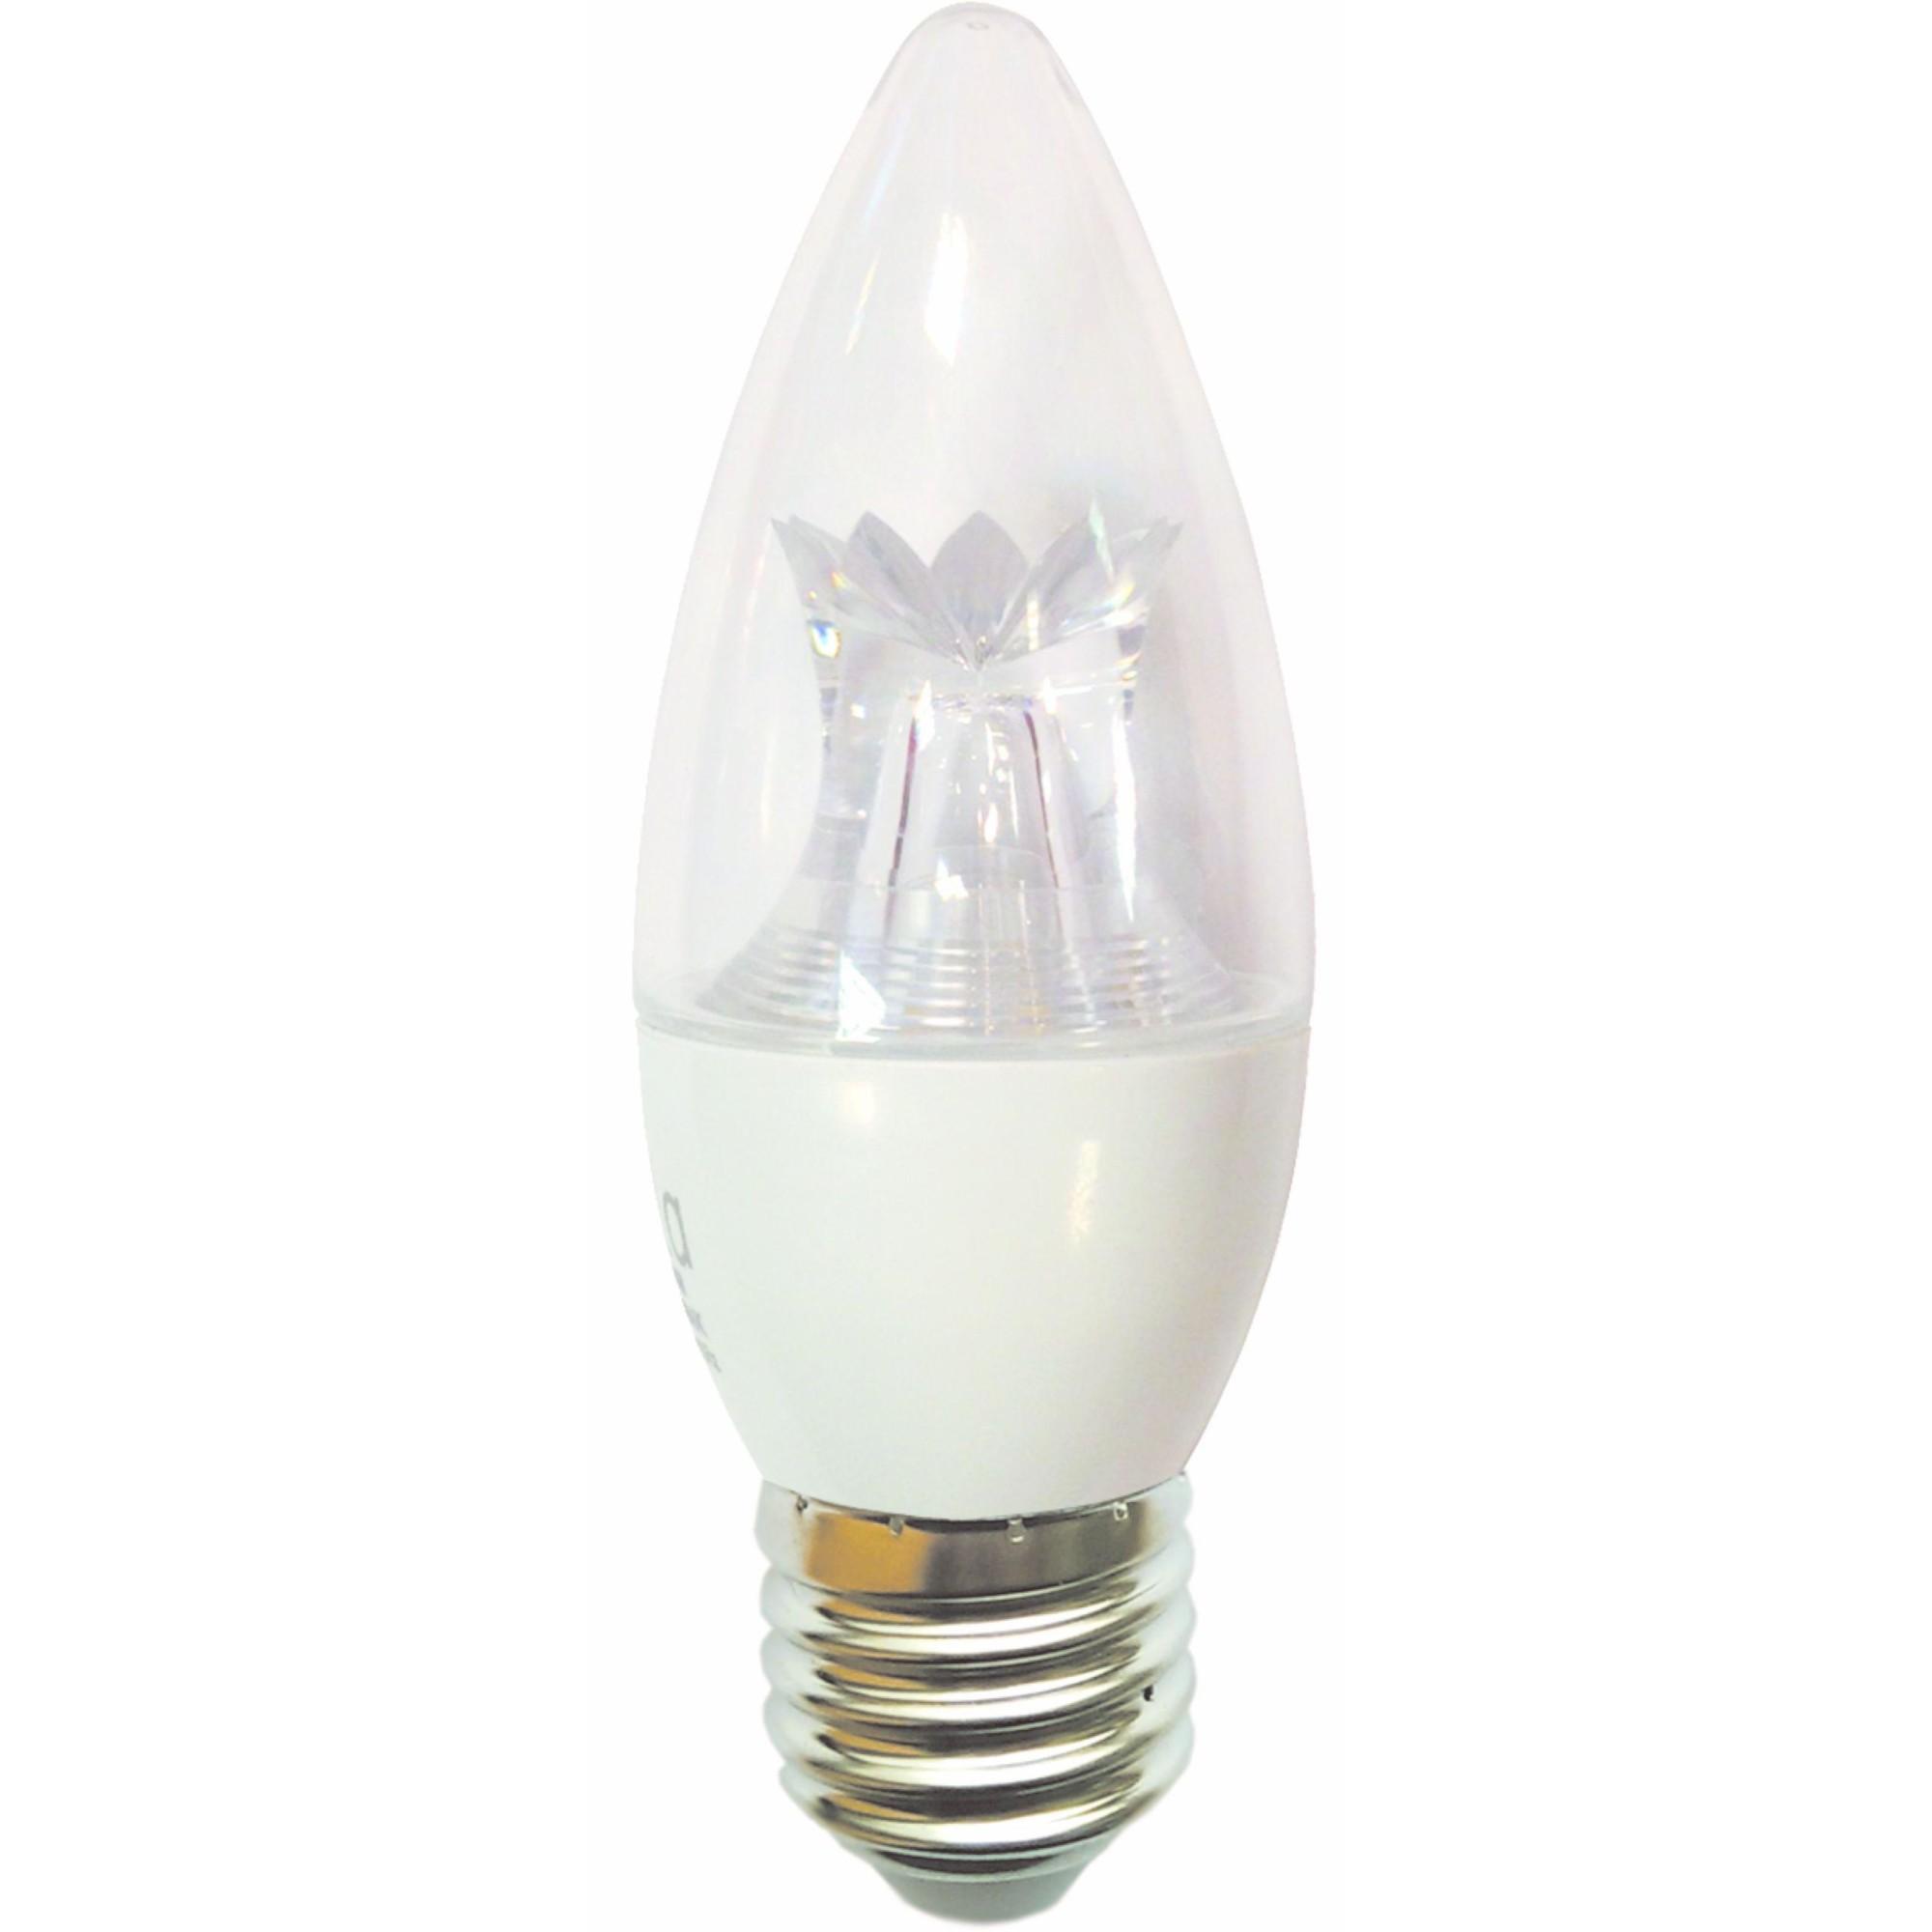 Лампа Ecola Premium светодионая E27 7 Вт свеча 630 Лм теплый свет